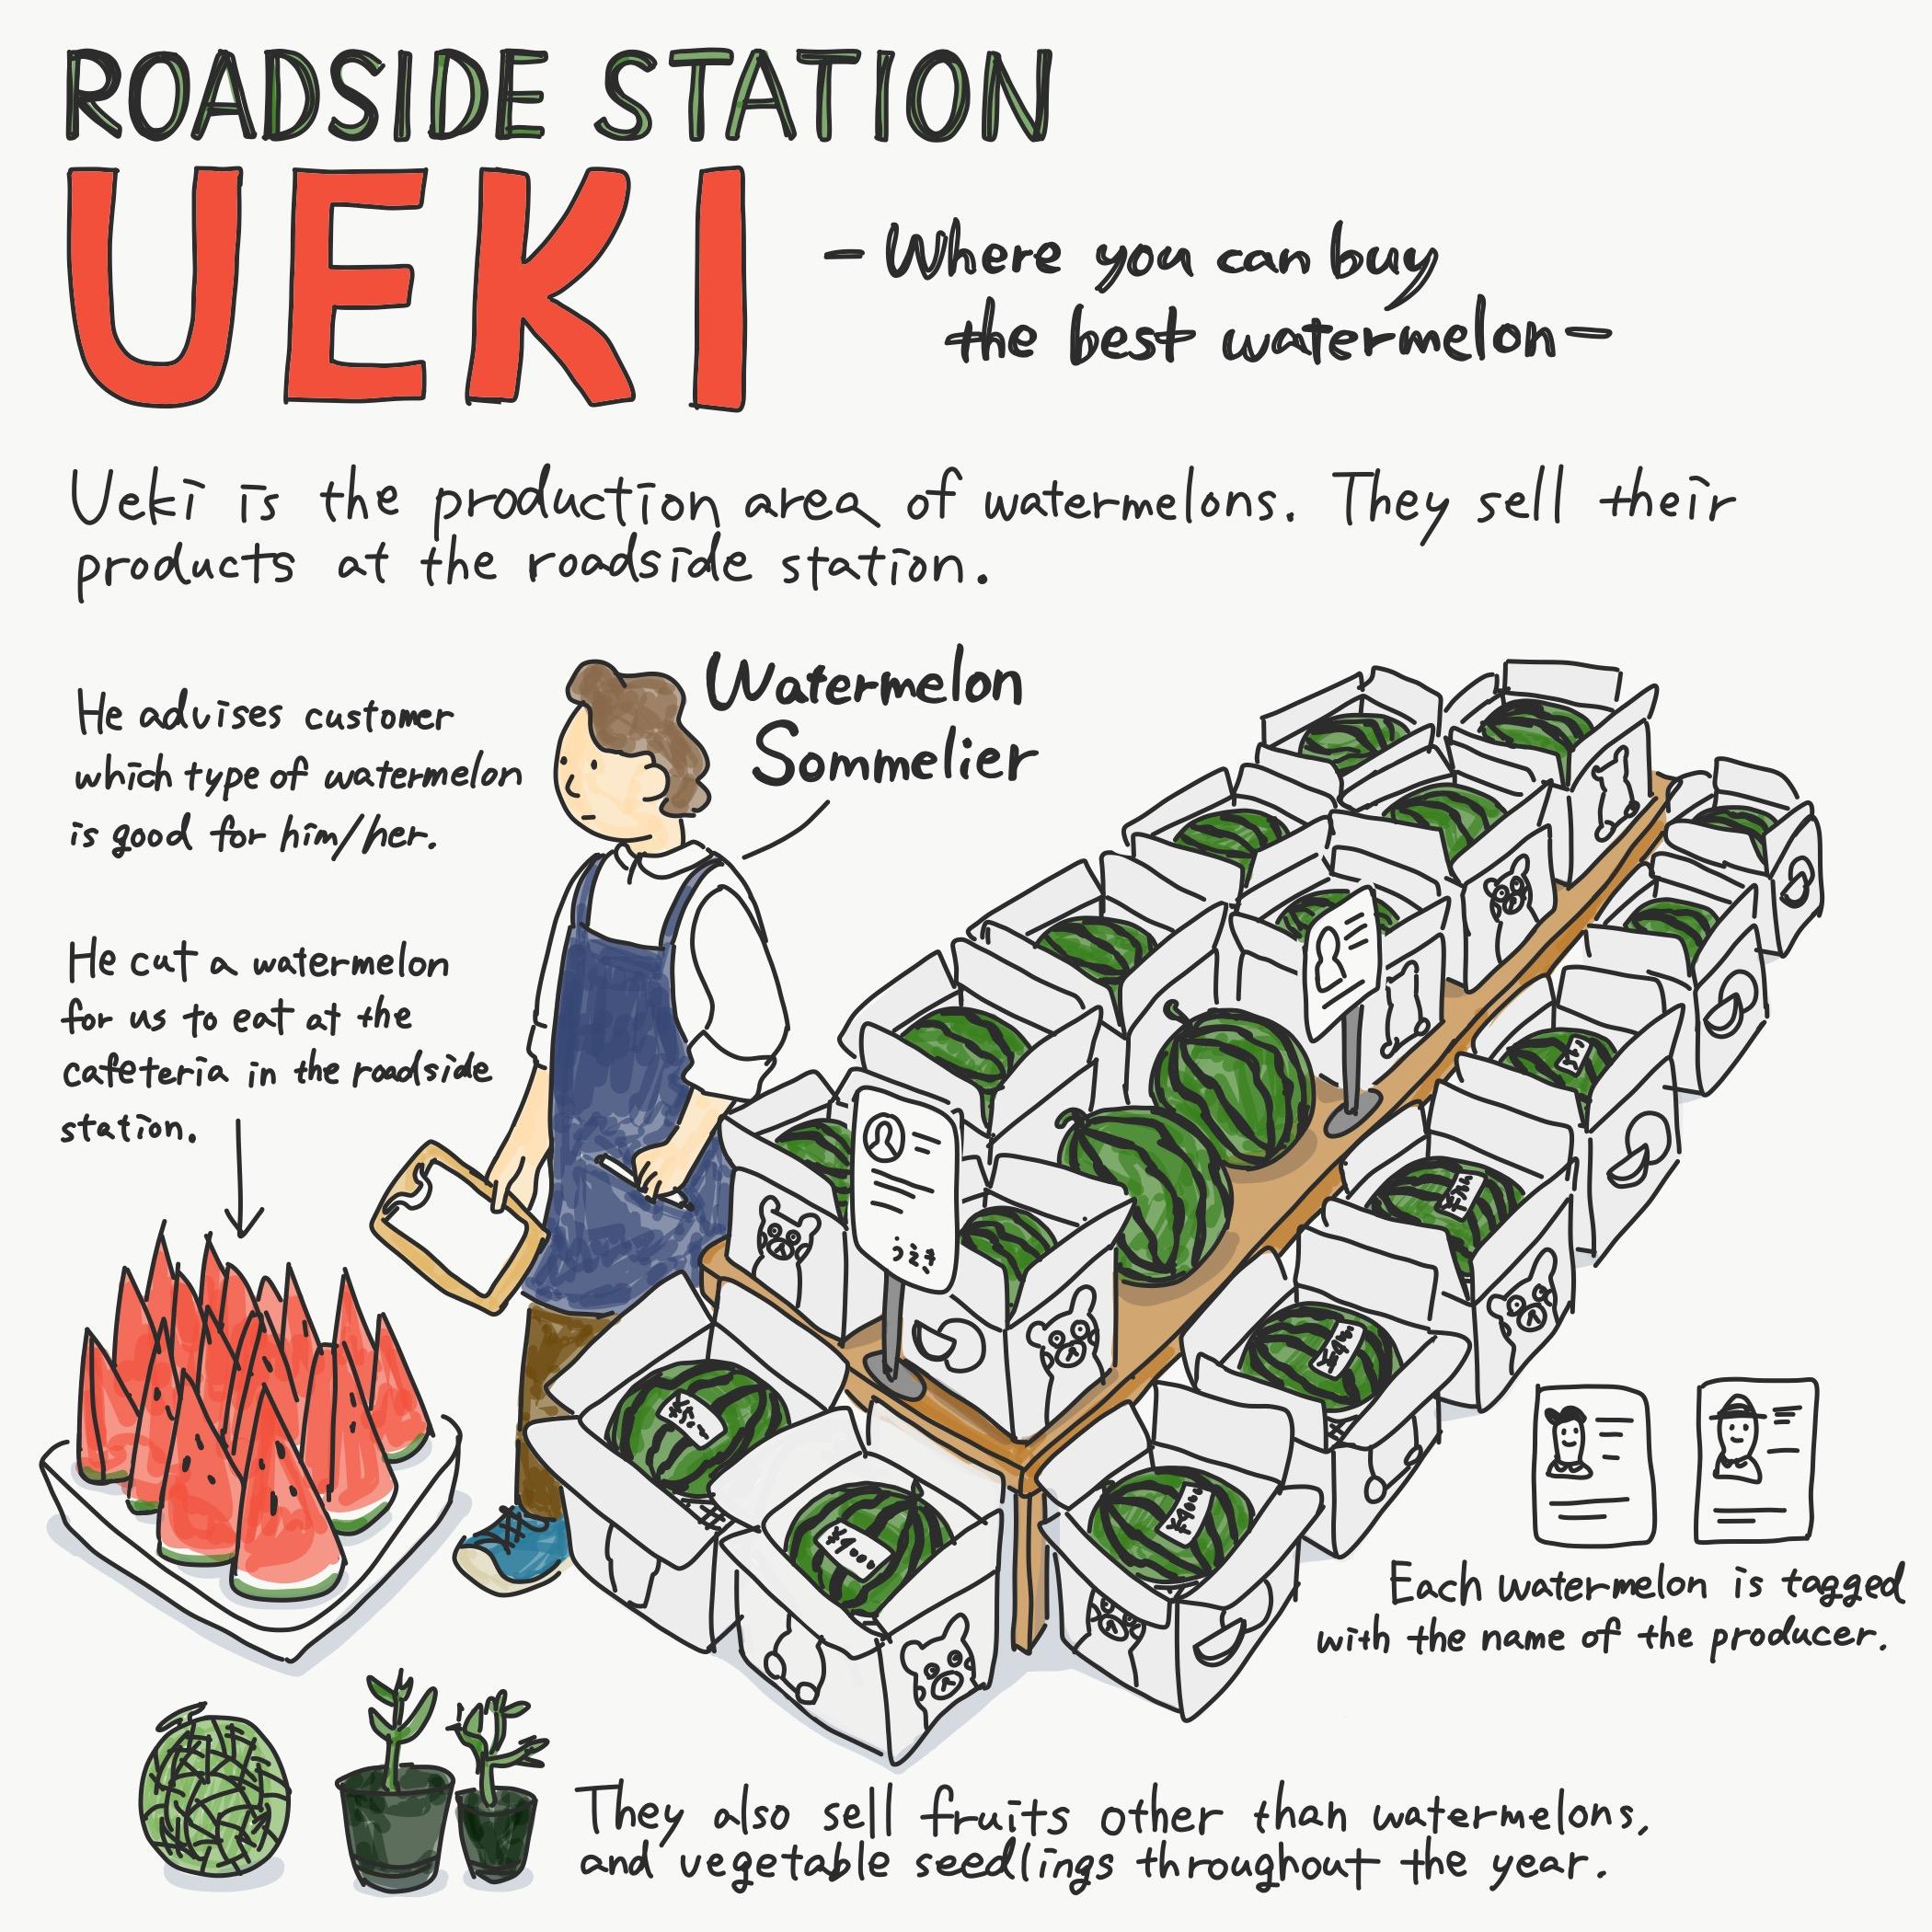 Roadside Station UEKI Image